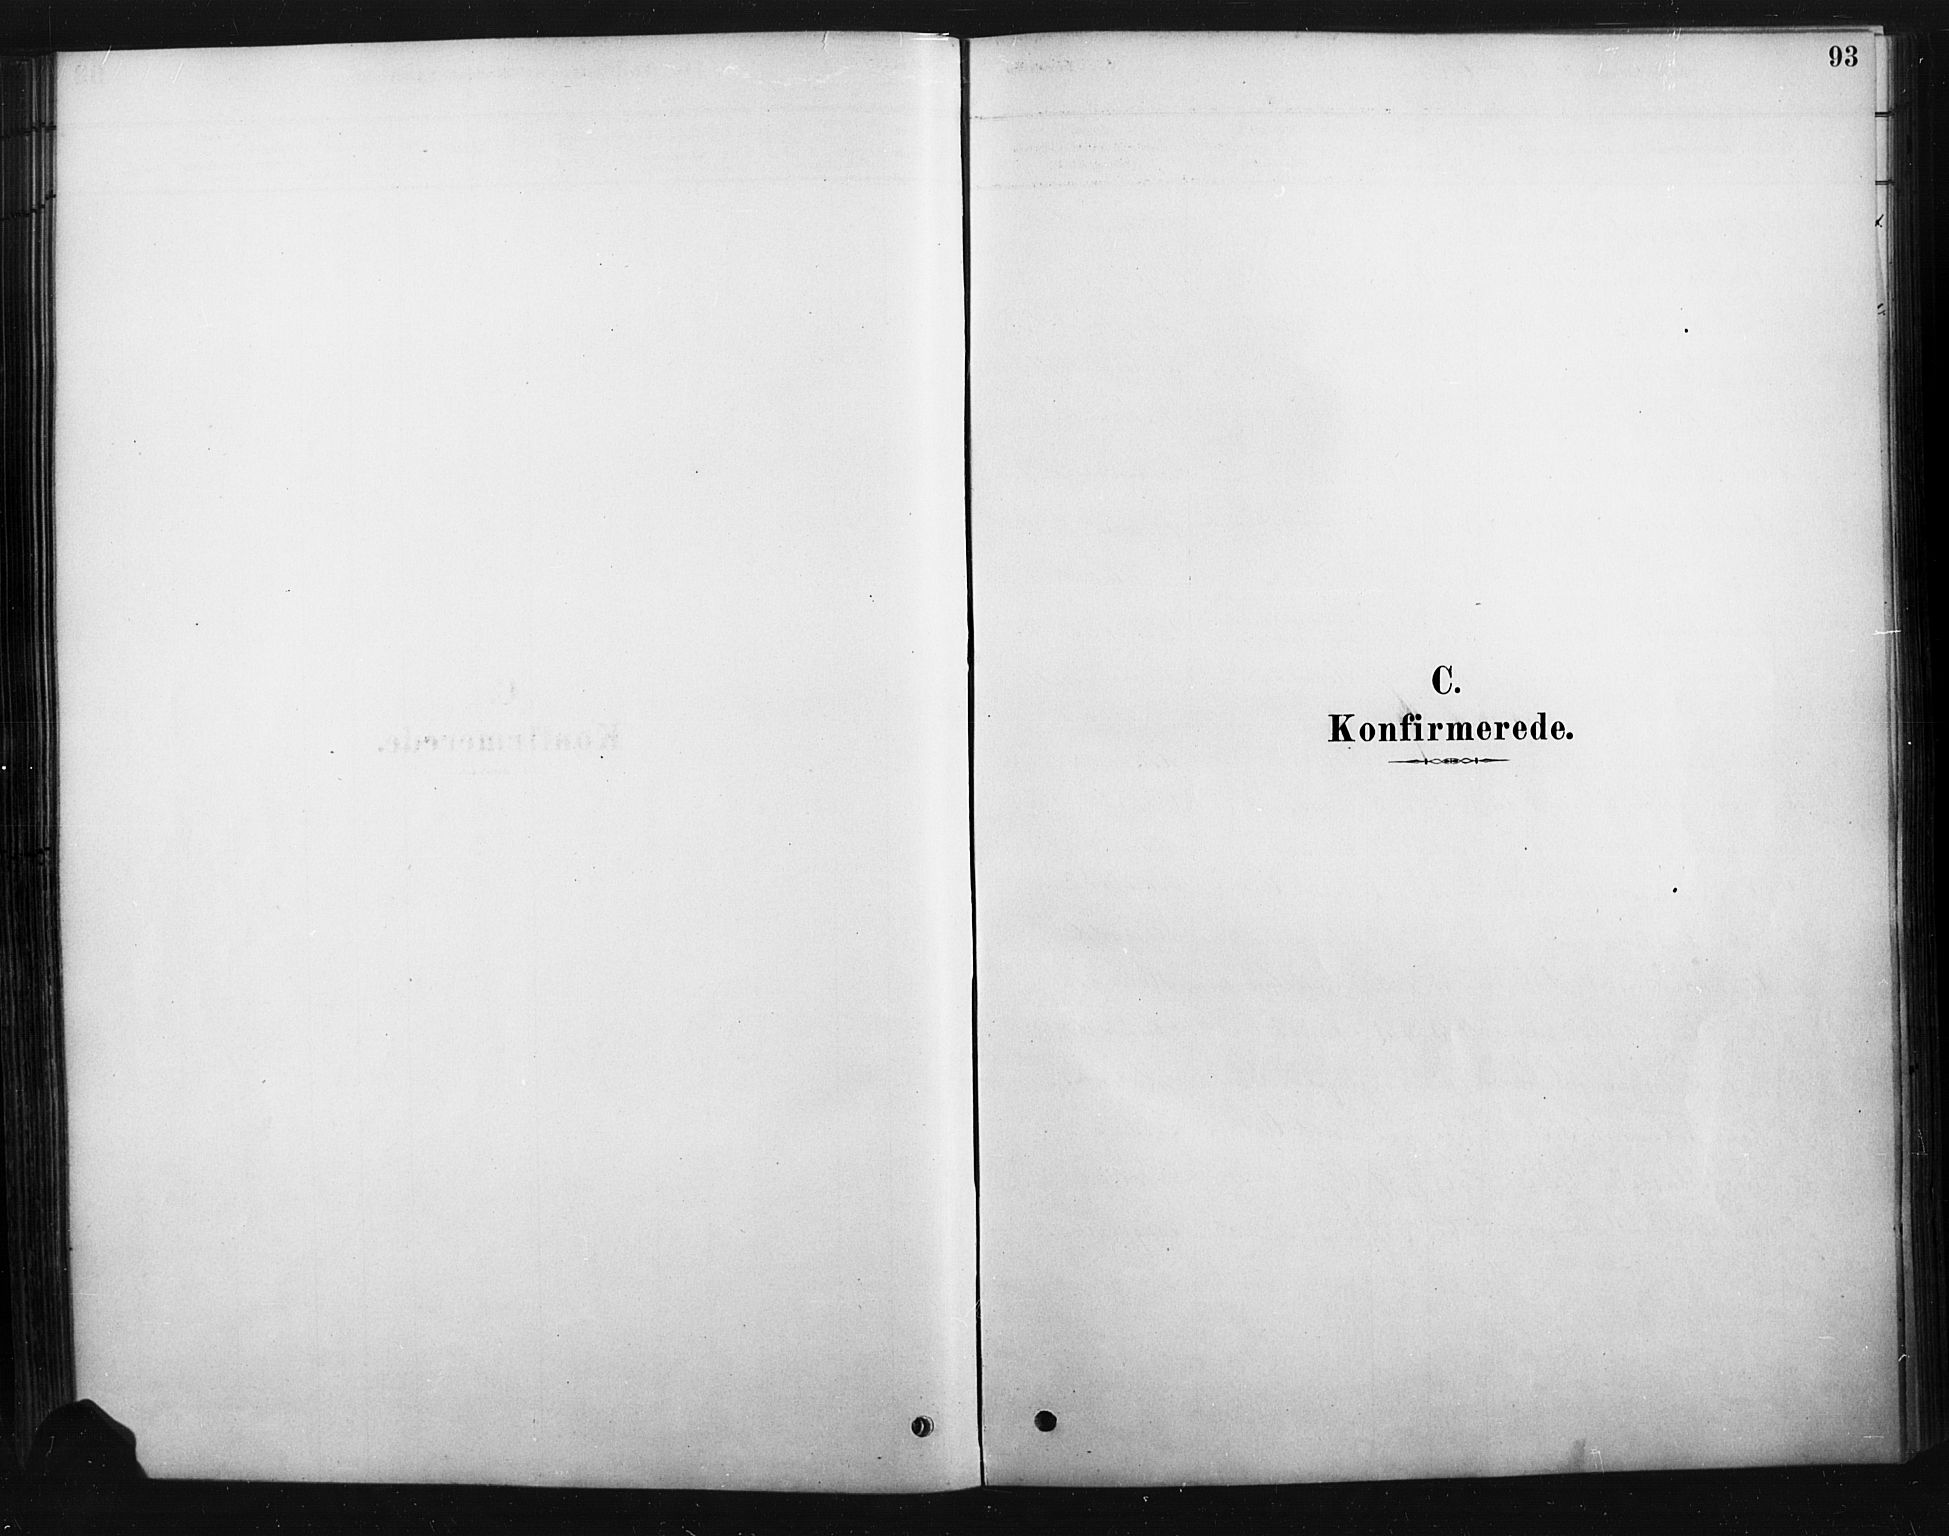 SAH, Rendalen prestekontor, H/Ha/Haa/L0010: Ministerialbok nr. 10, 1878-1901, s. 93